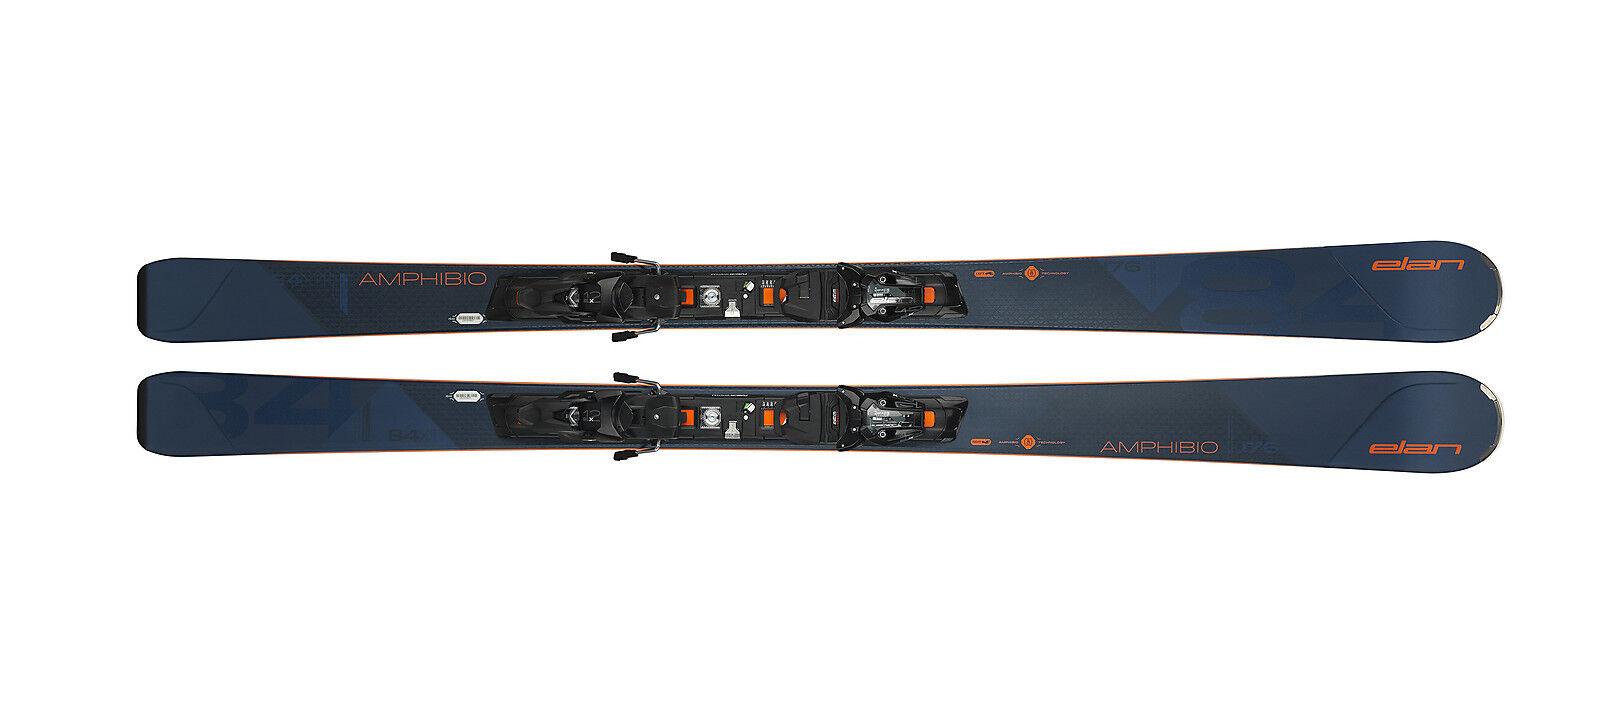 Elan Amphibio 84 XTI Fusion in 170 cm inkl. Elan ELX 12 GW - Neuware 18/19